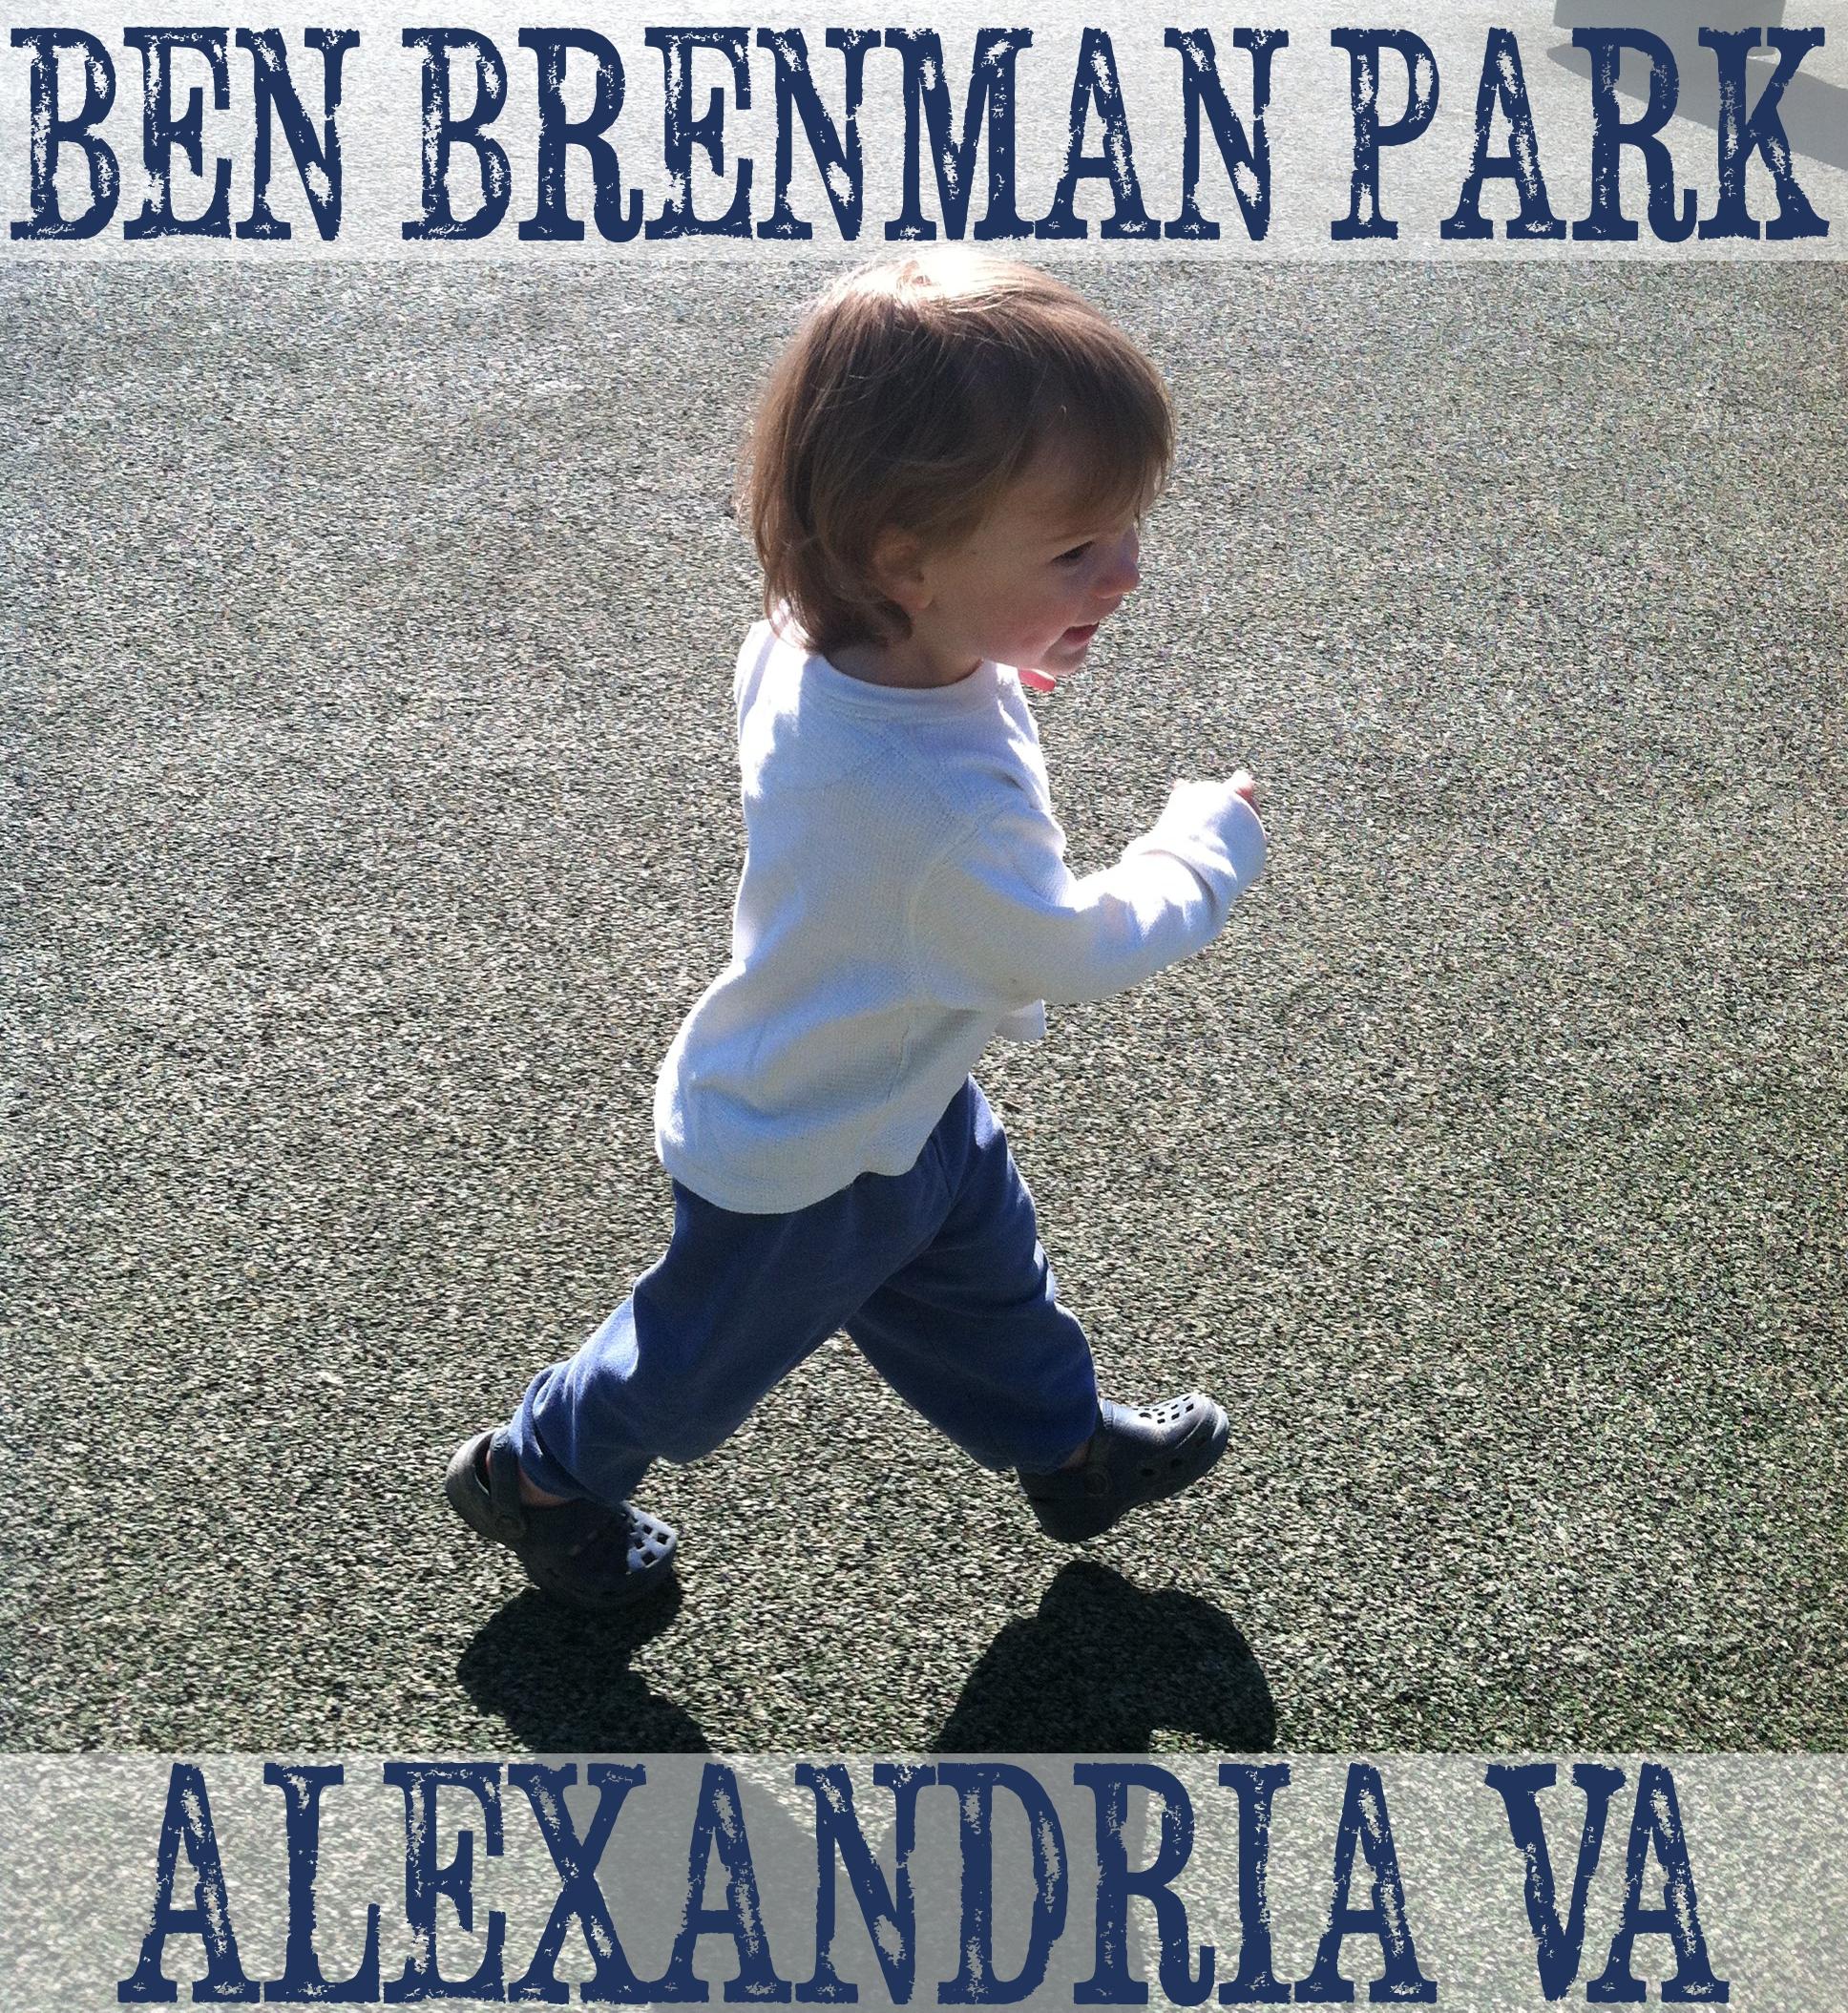 Ben Brenman Park Alexandria VA